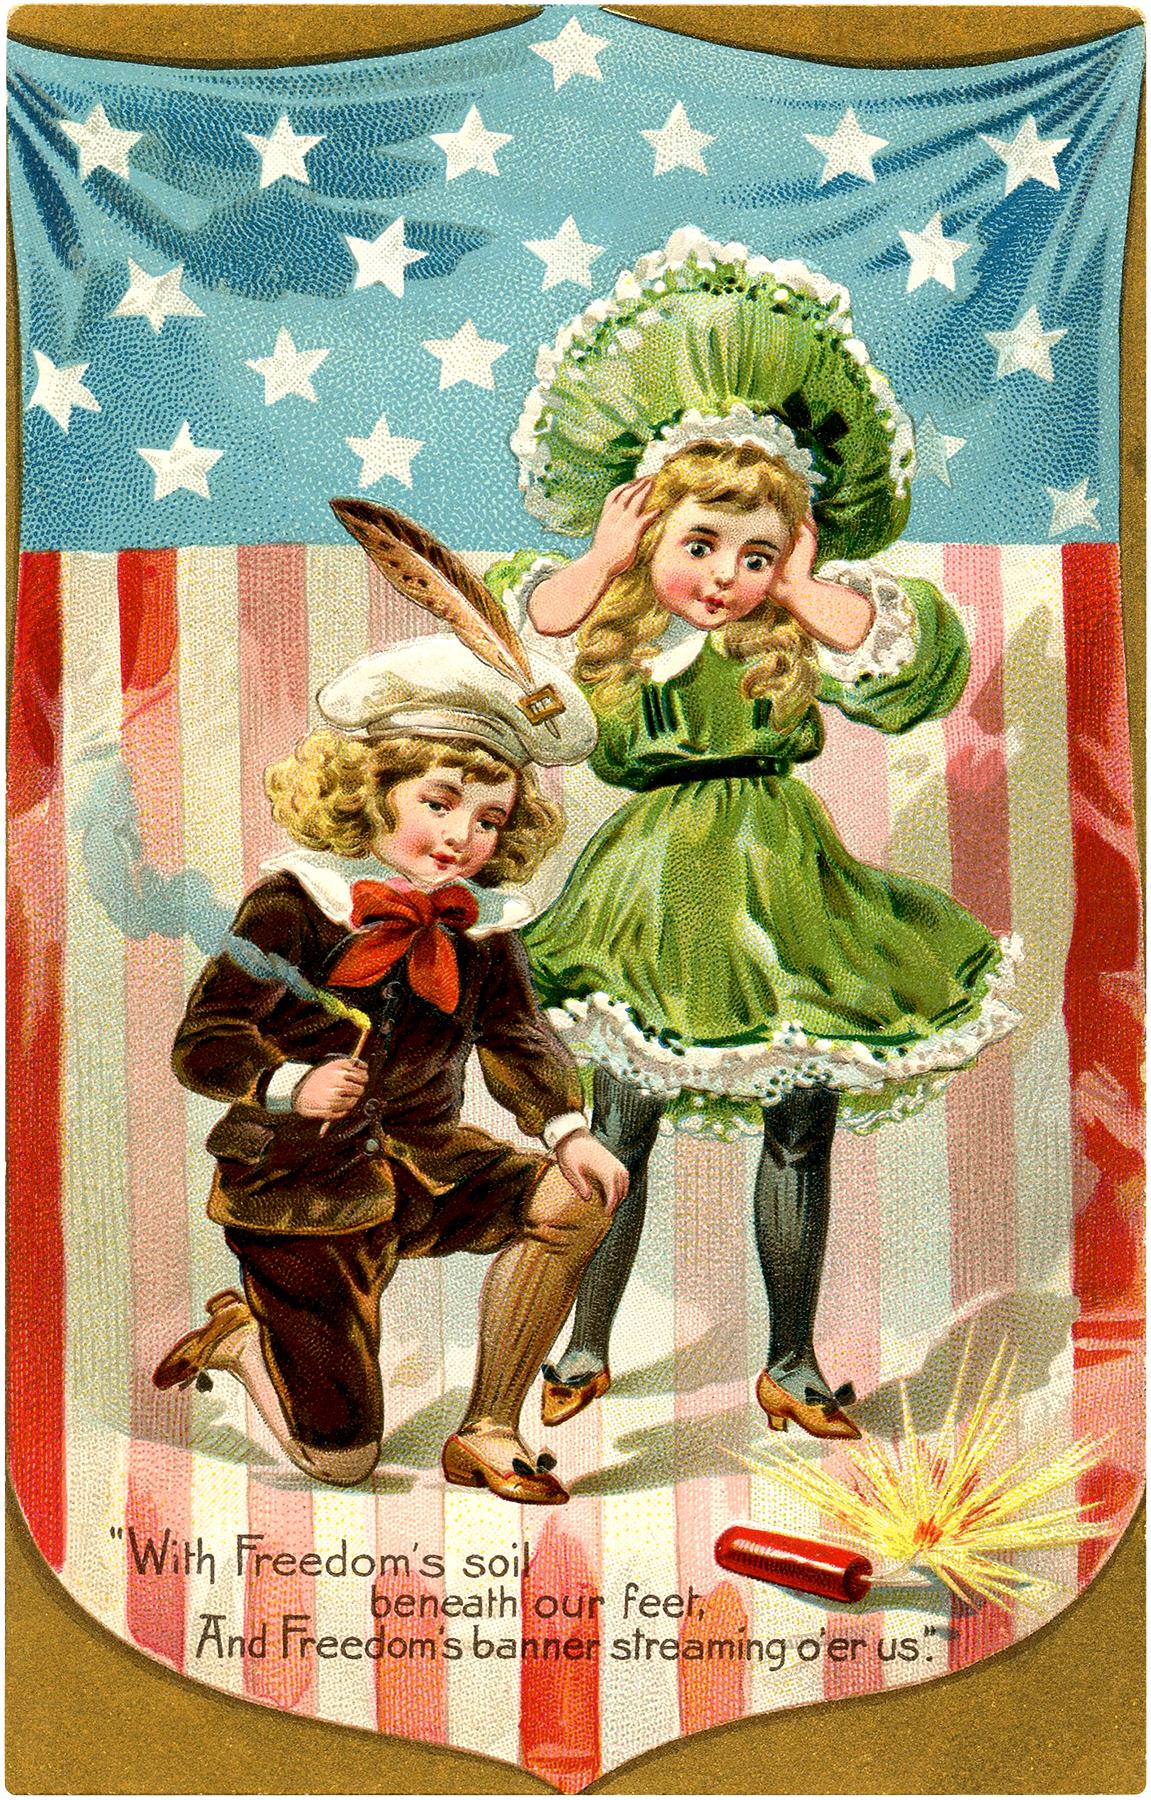 Vintage Firecracker Kids Image